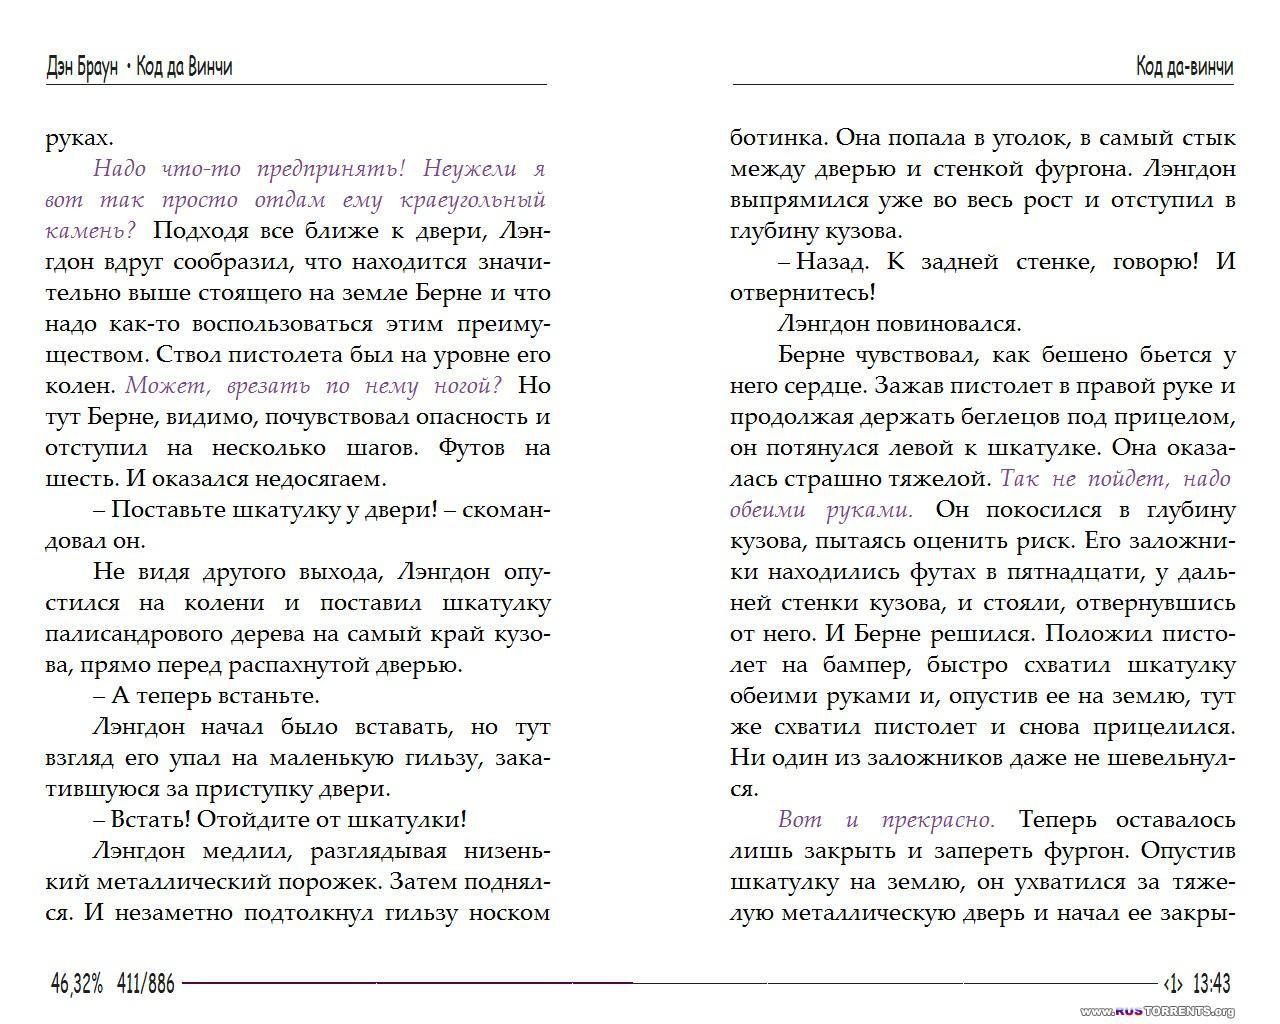 Дэн Браун - Собрание сочинений